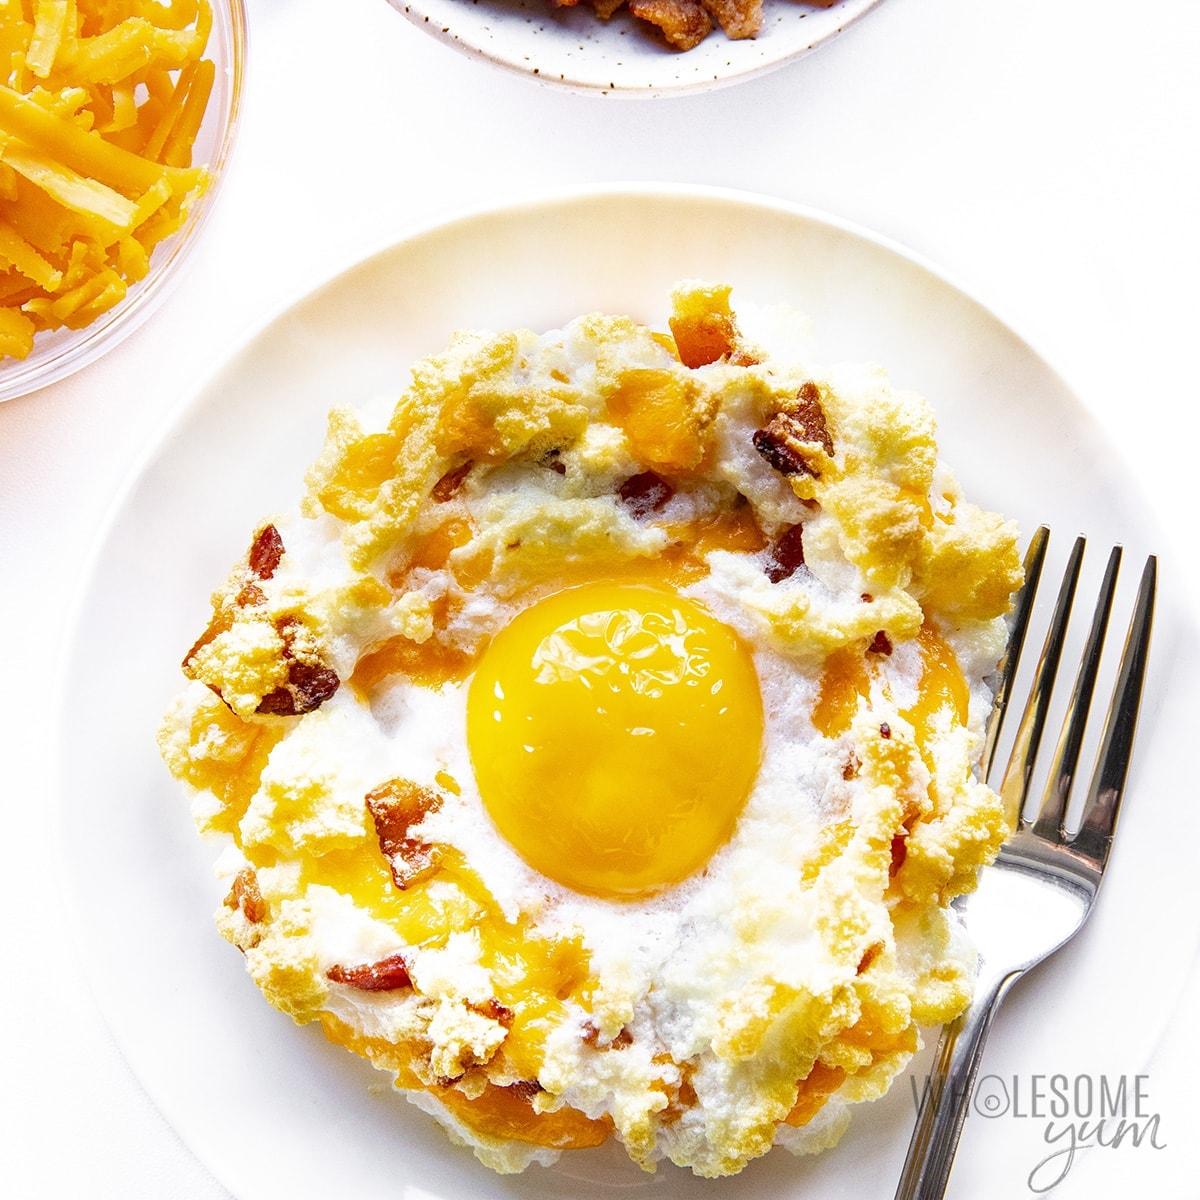 How to make cloud eggs 5 ways - recipe pin